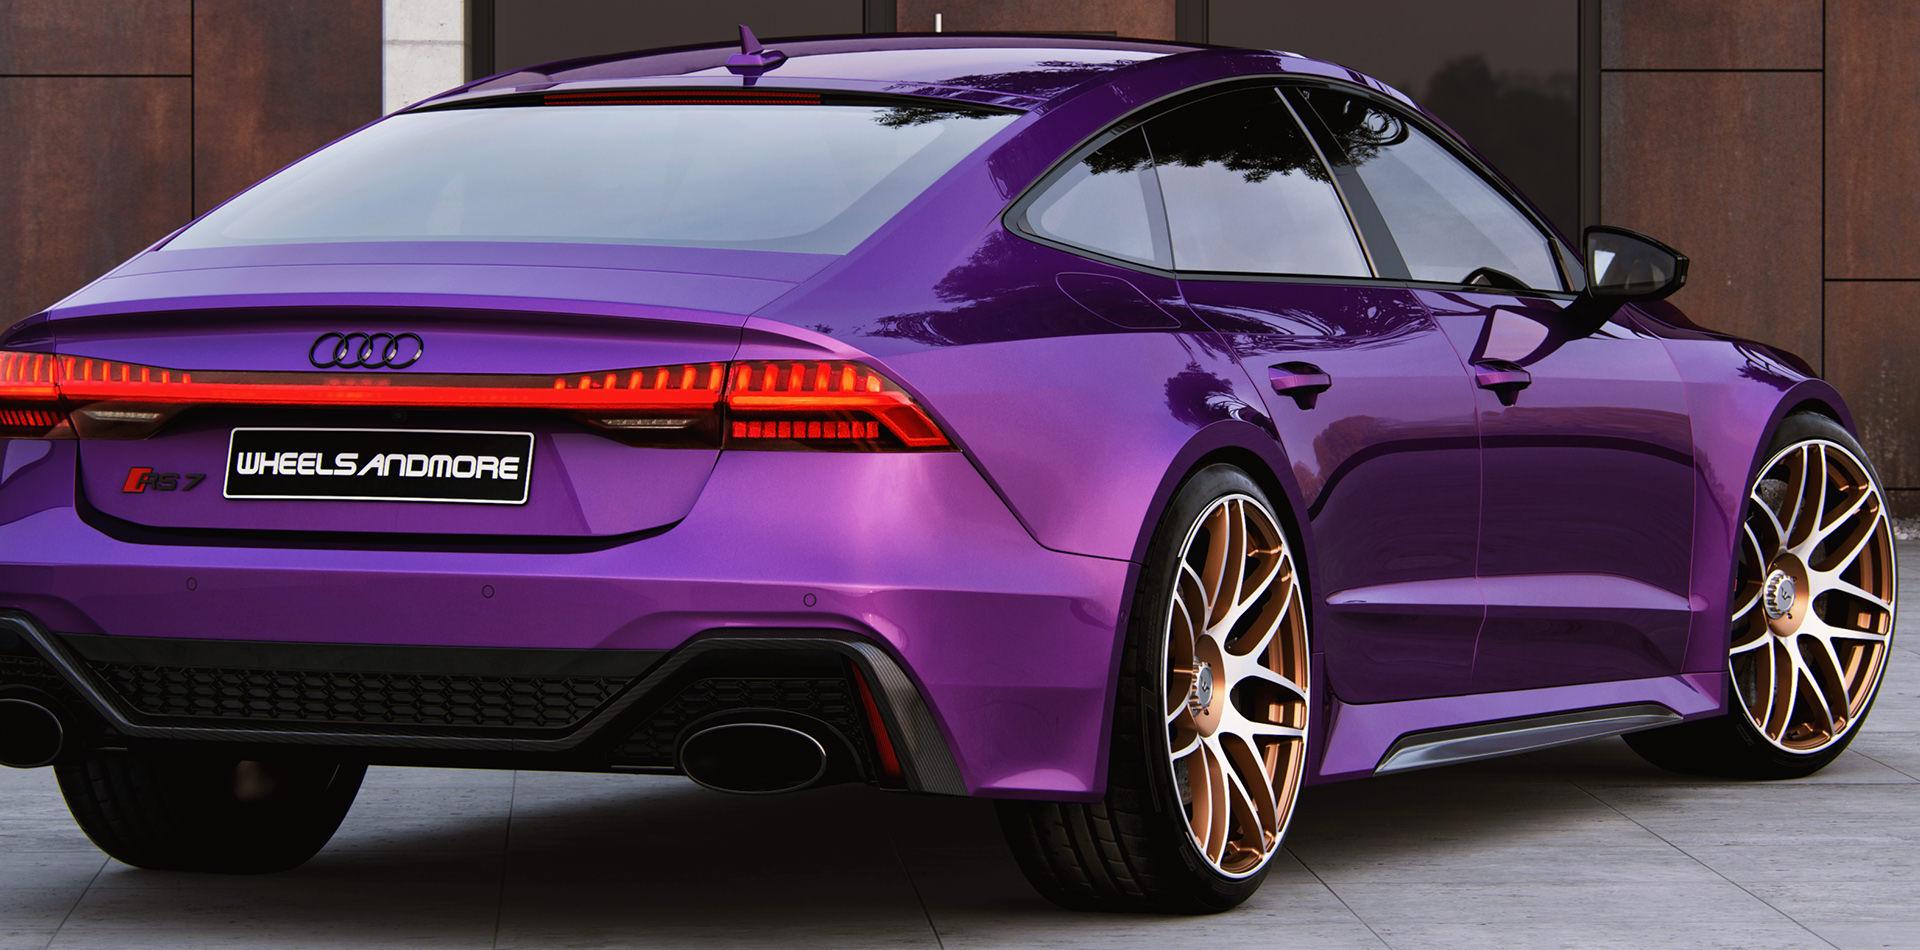 Purple Audi RS7 rear